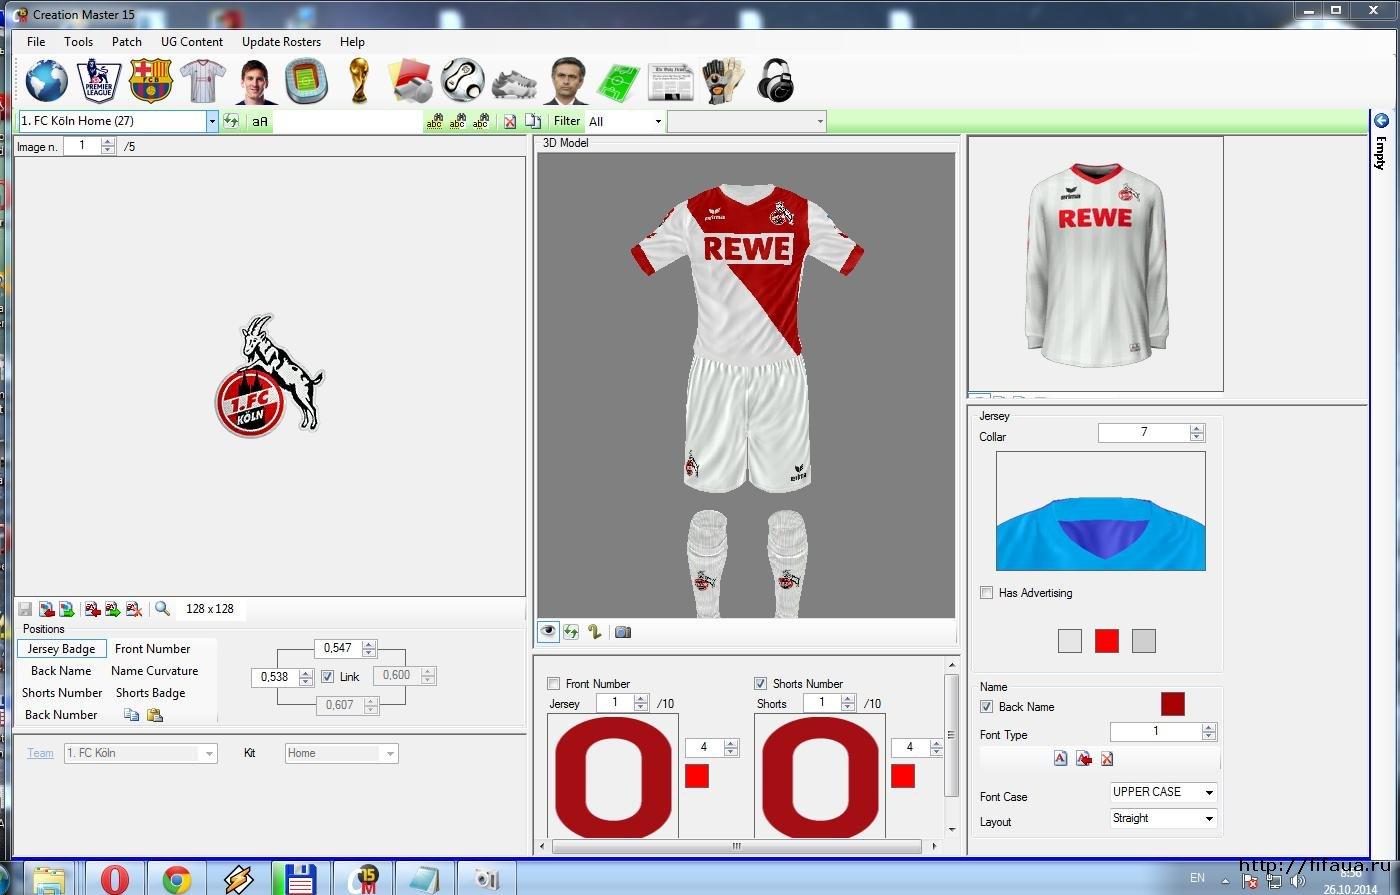 CM 15 Creation Master для FIFA 15. Найдено публикаций: 1. Найдено публикац